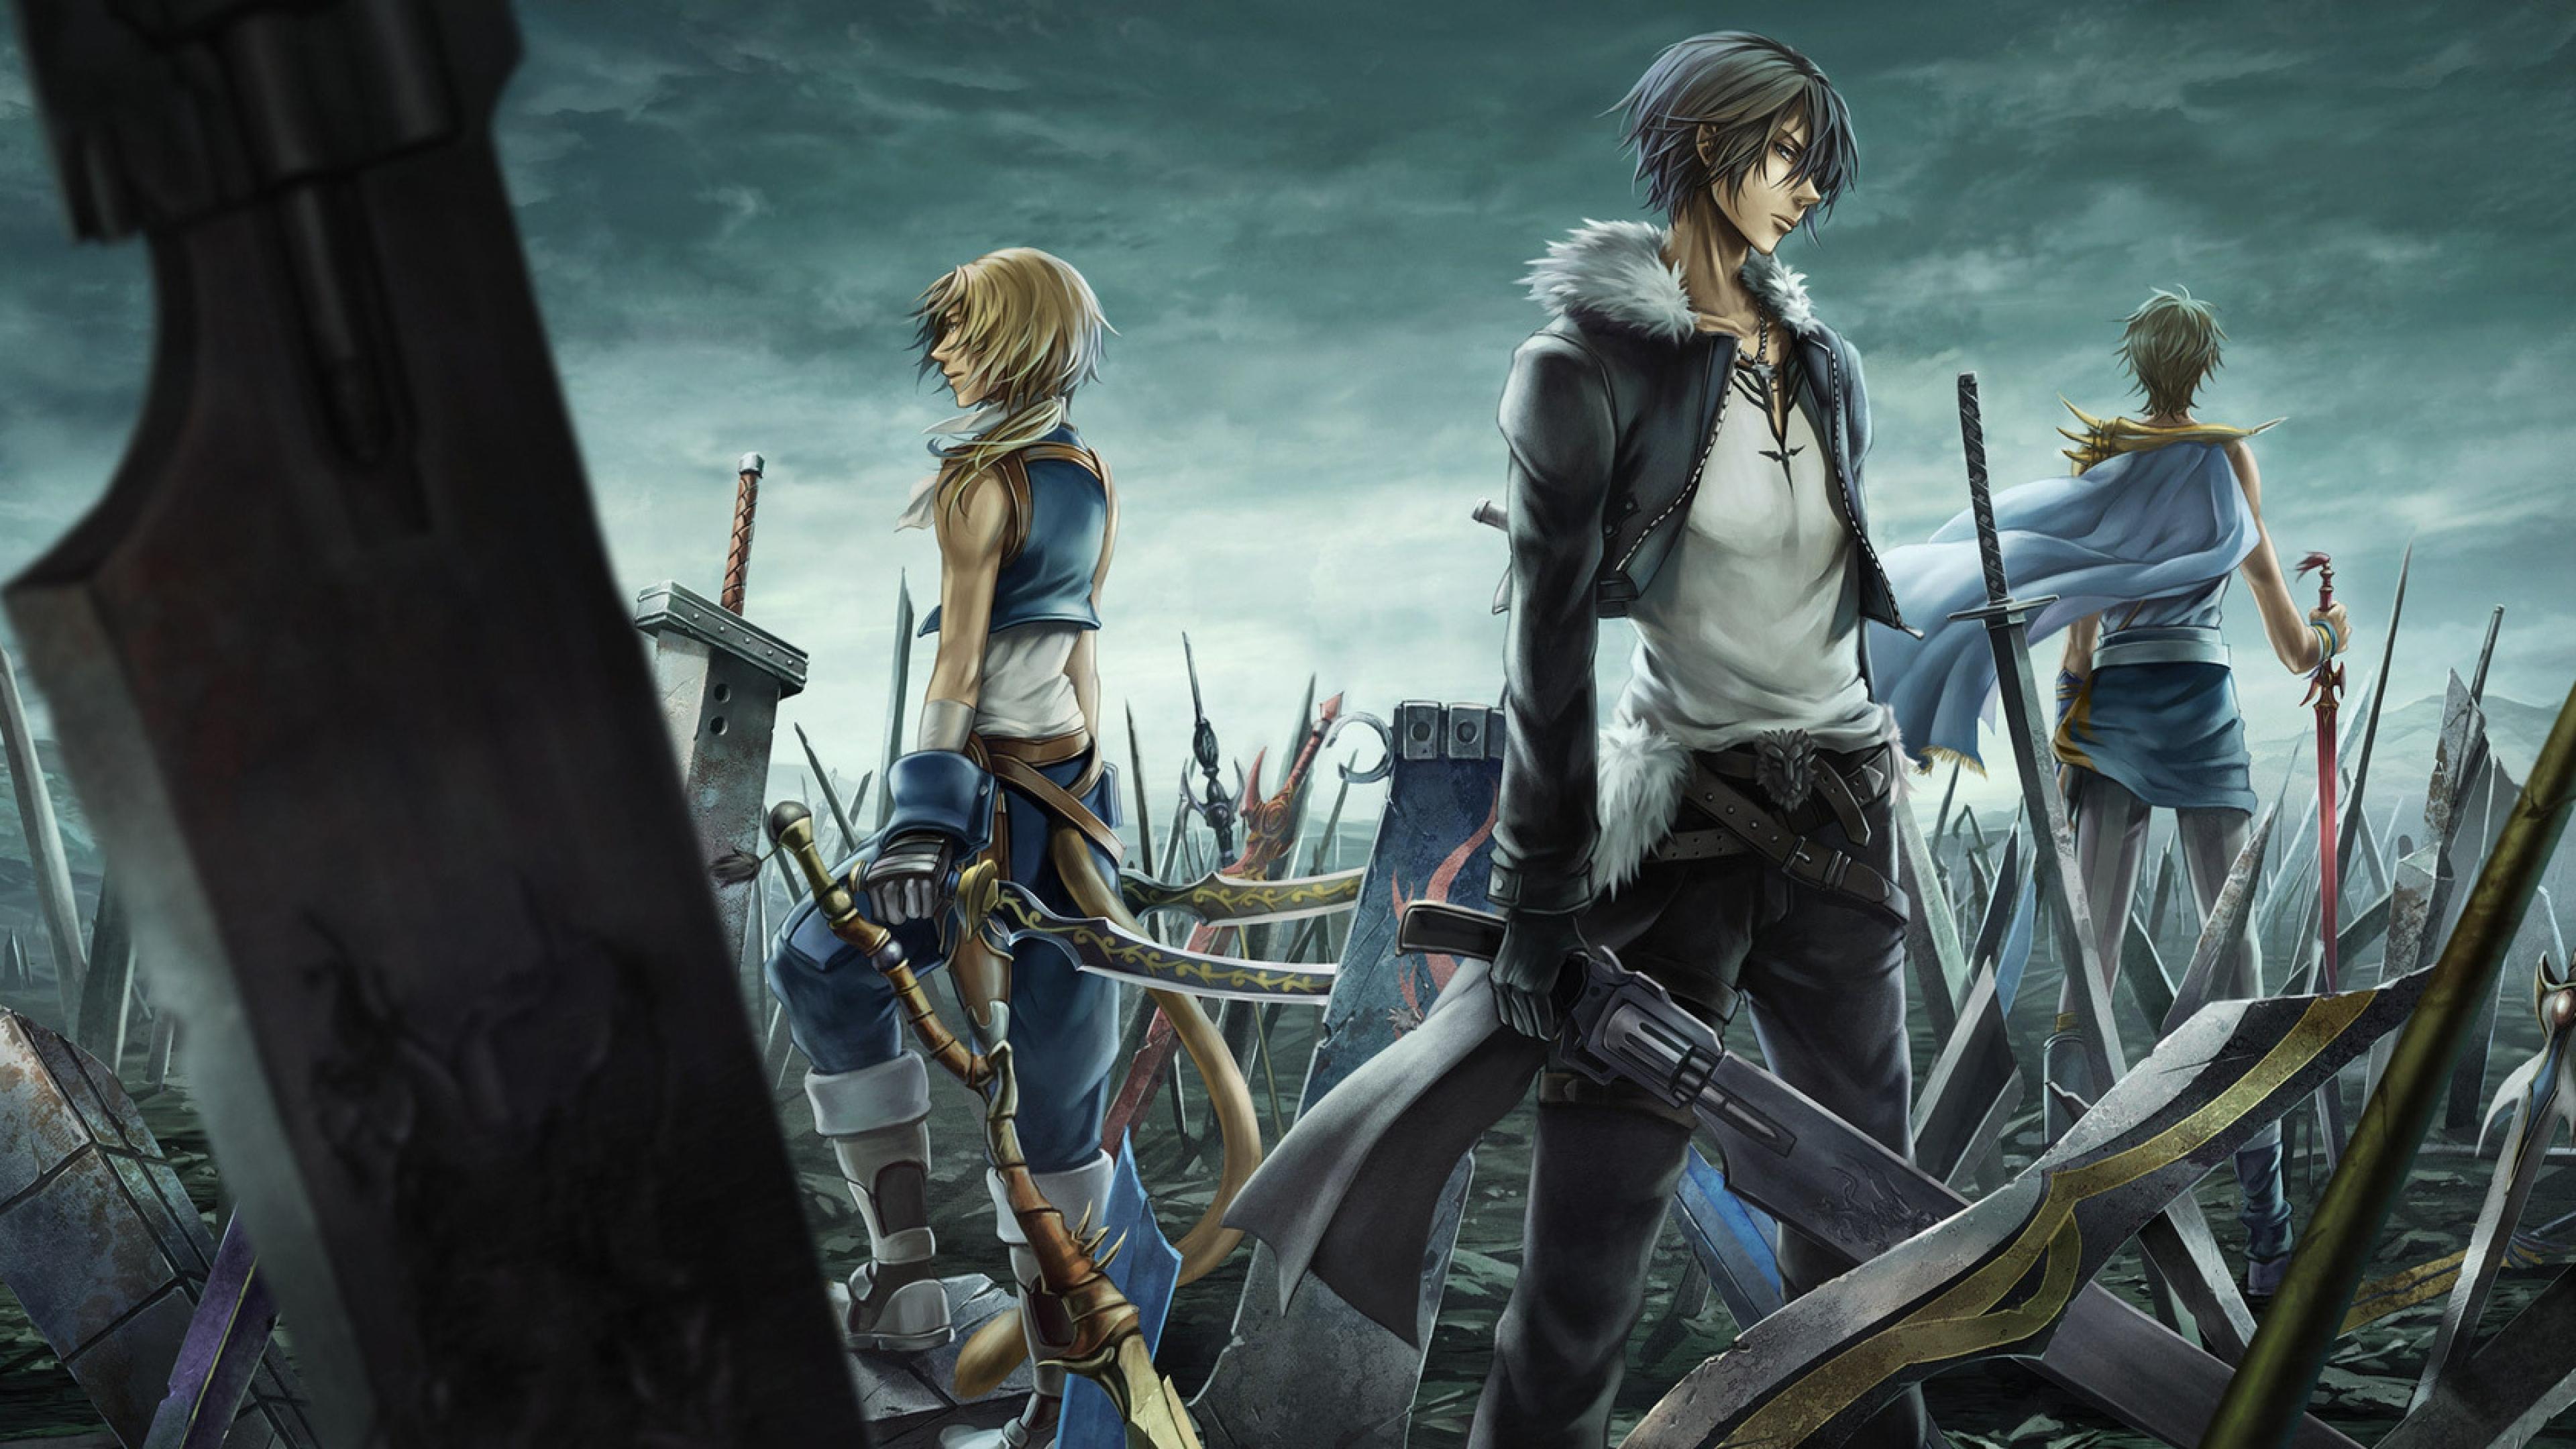 Final Fantasy HD Wallpapers 3840x2160